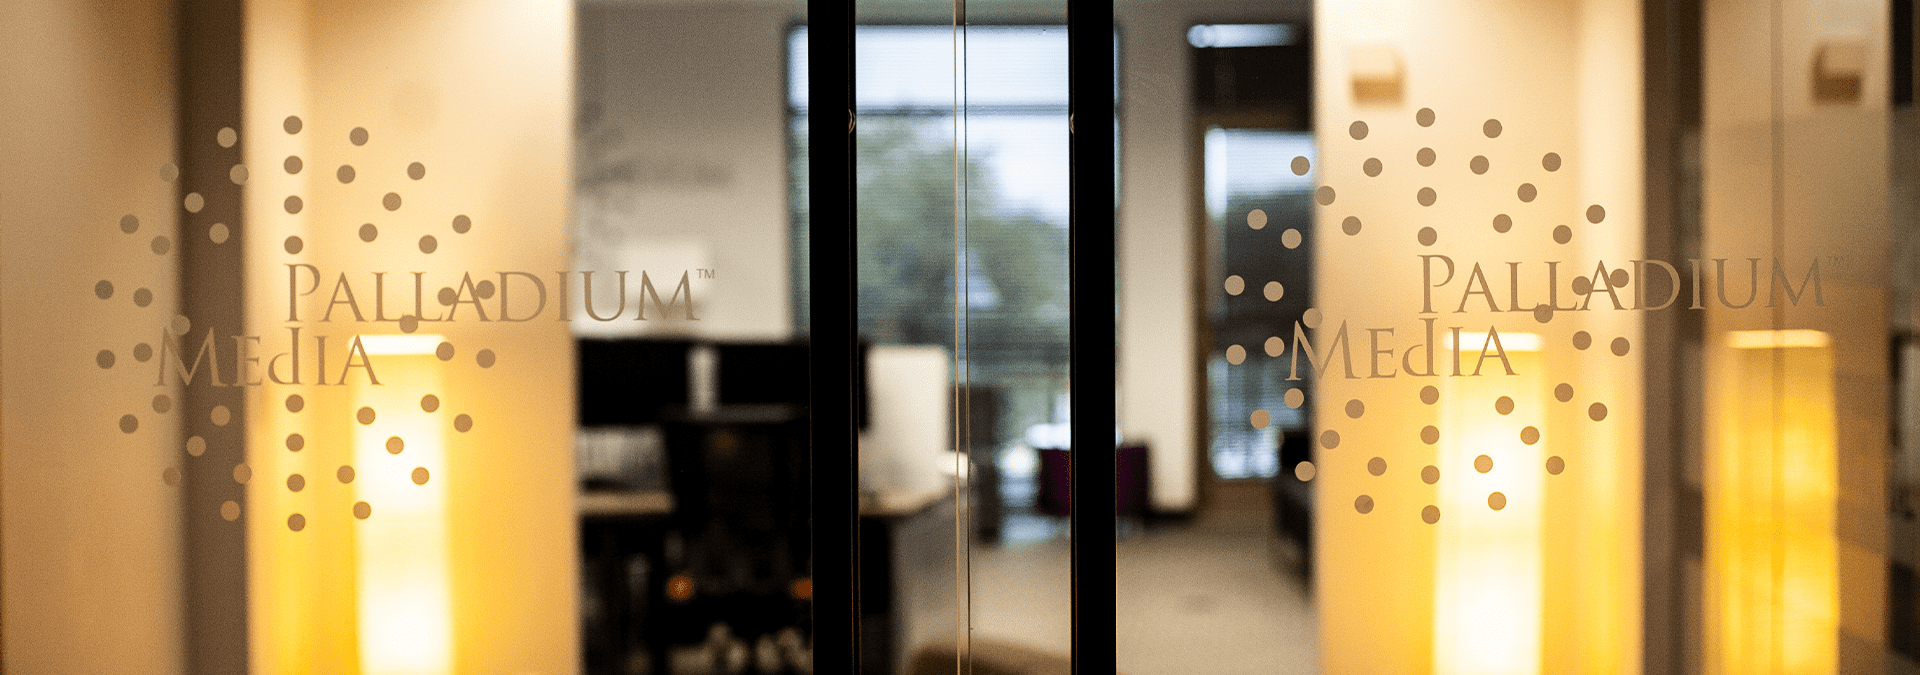 Palladium Media - A San Antonio Based Advertising Agency